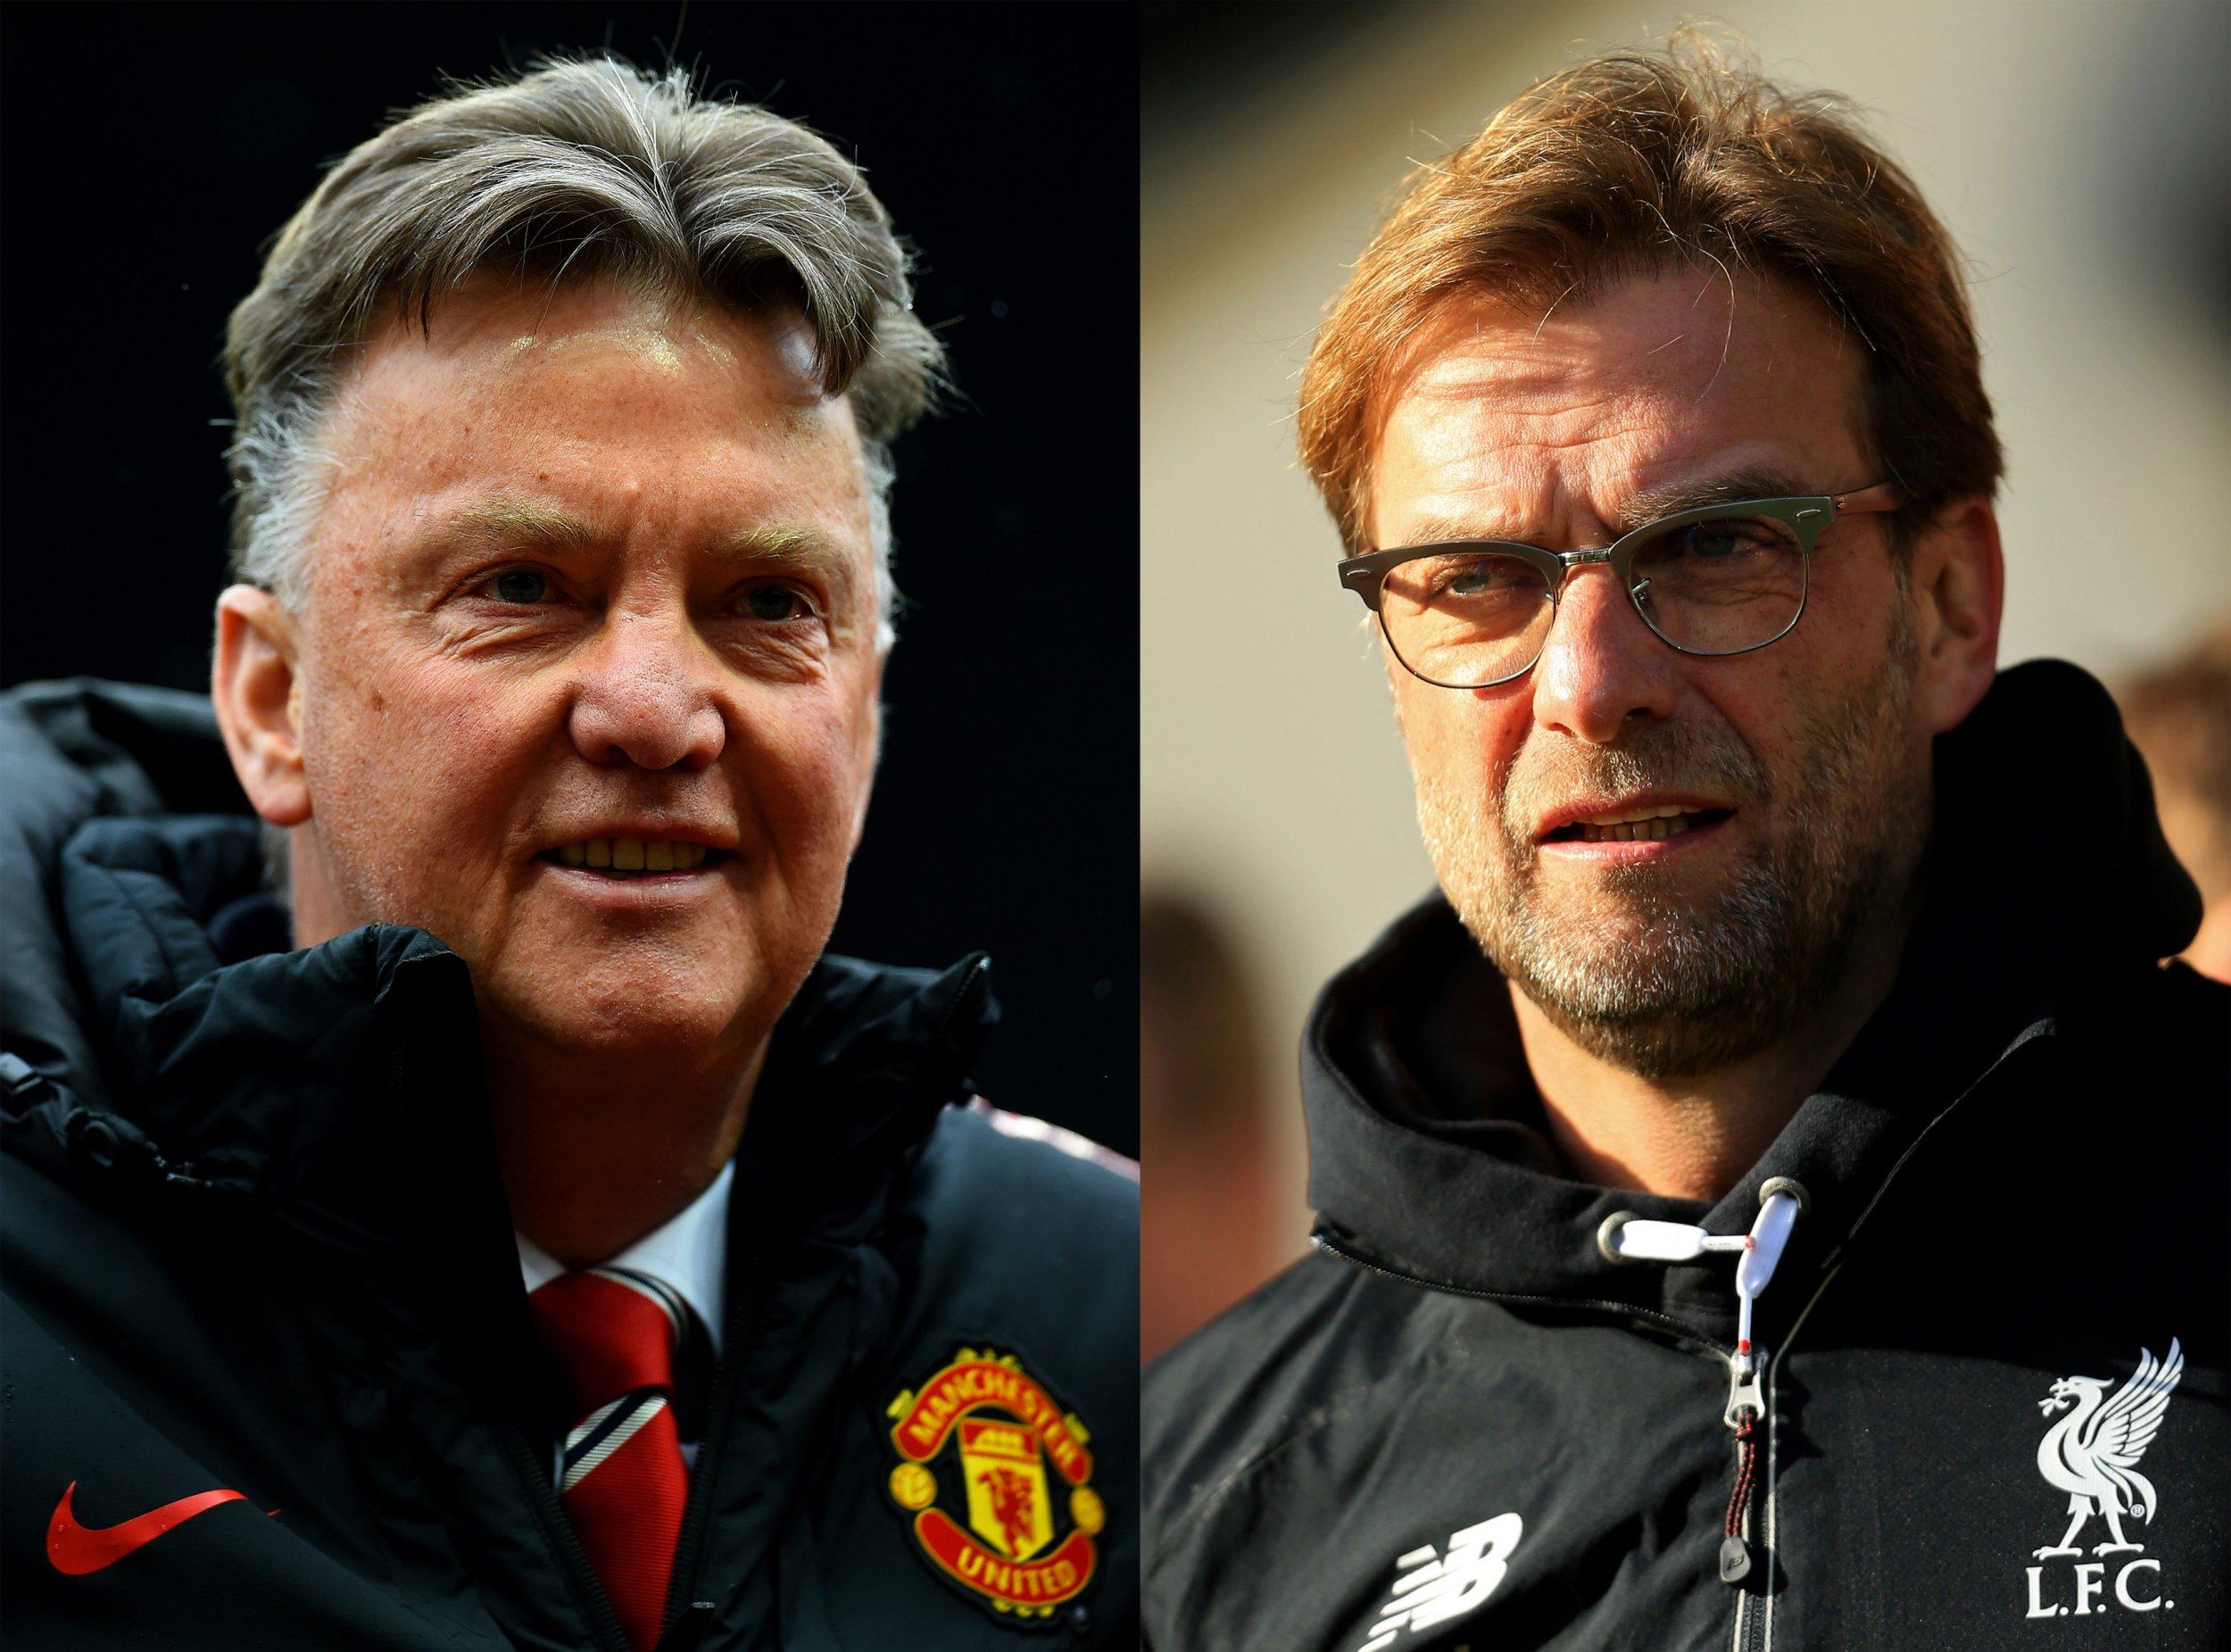 Manchester United manager Louis Van Gaal, left, faces Jurgen Klopp's Liverpool on Thursday evening.